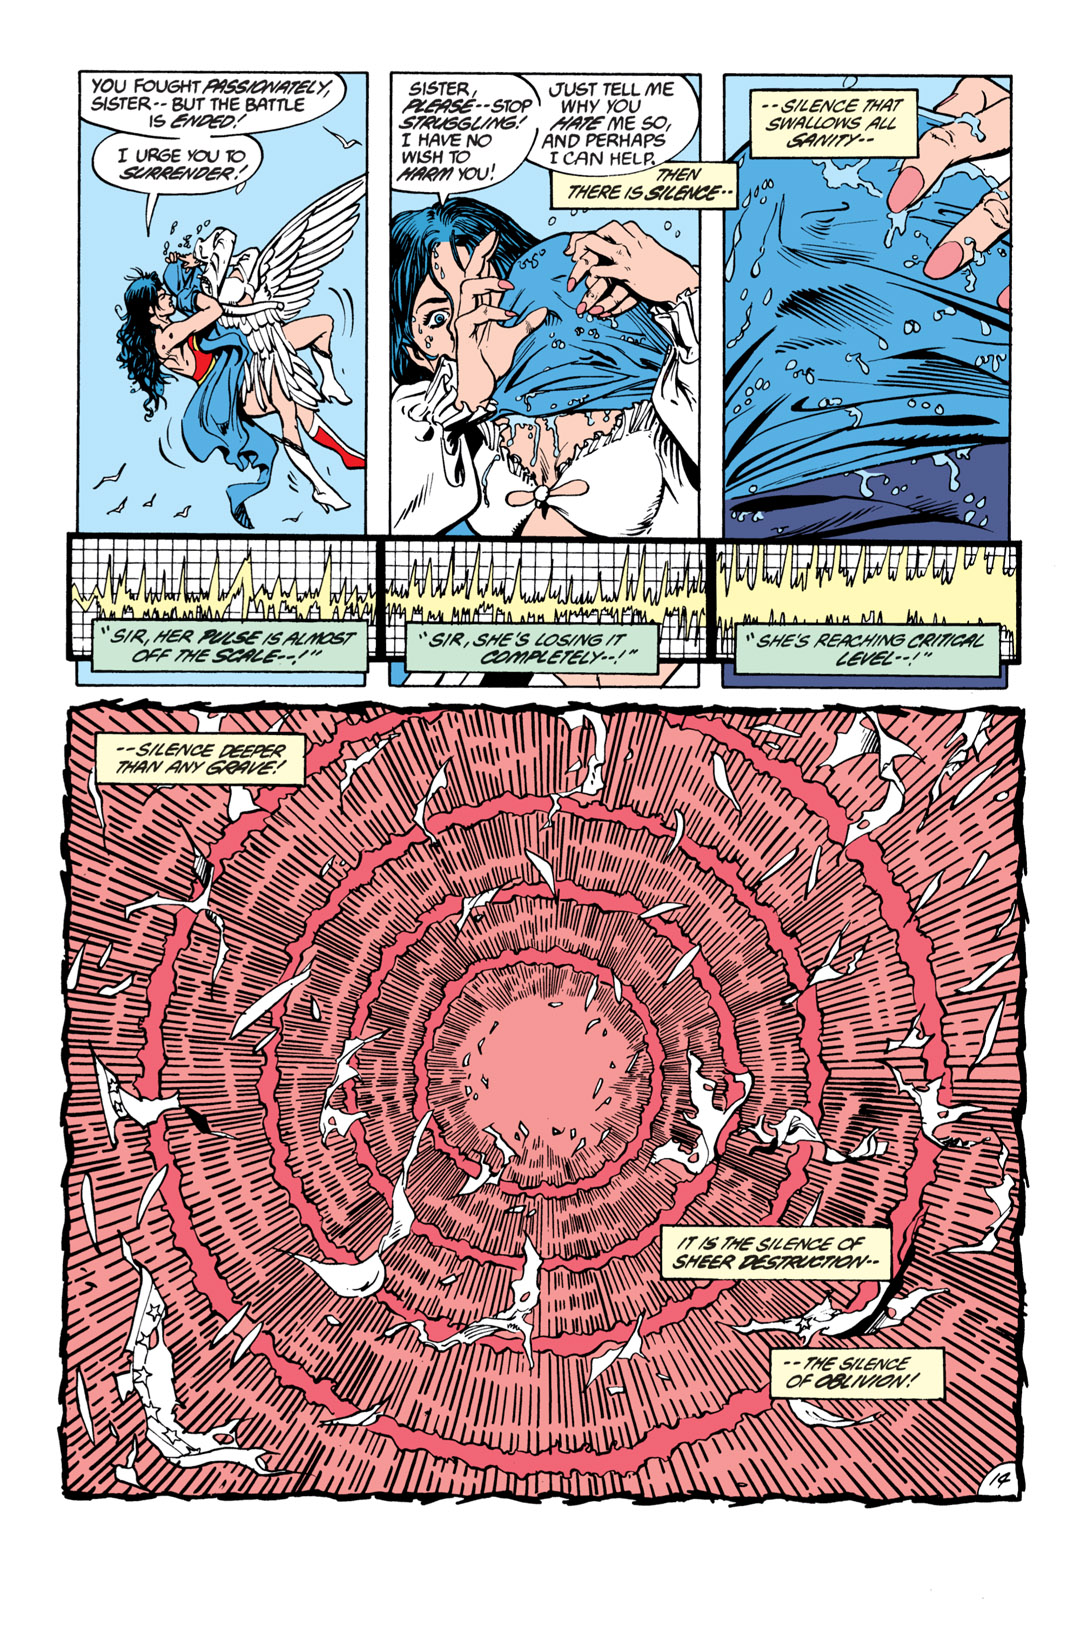 Read online Wonder Woman (1987) comic -  Issue #16 - 15